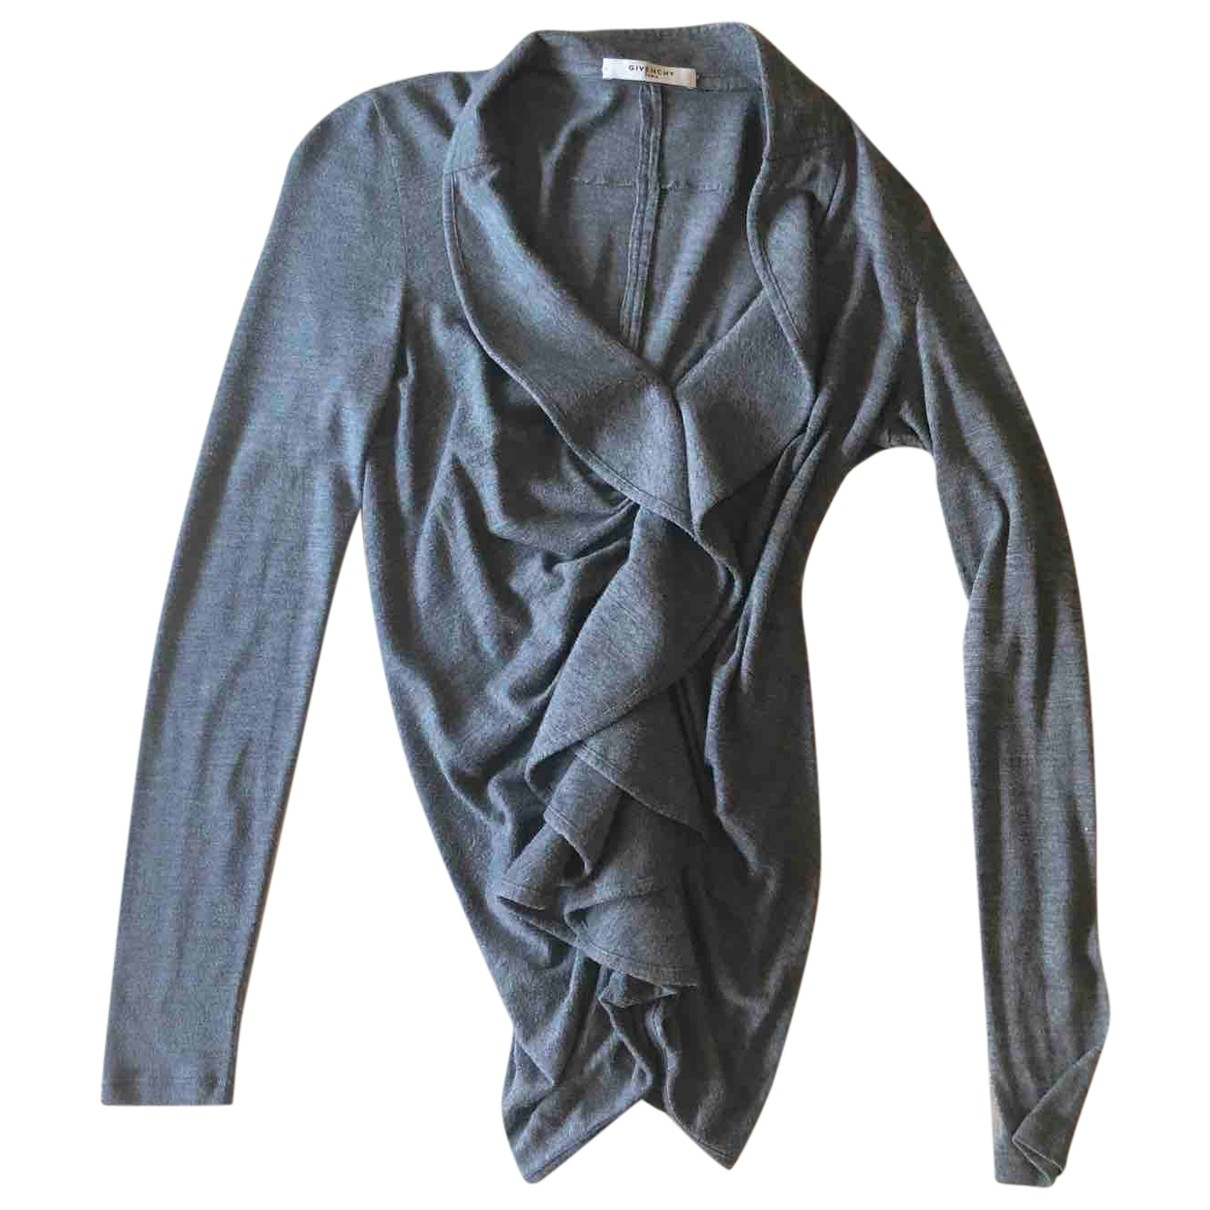 Givenchy - Pull   pour femme - gris